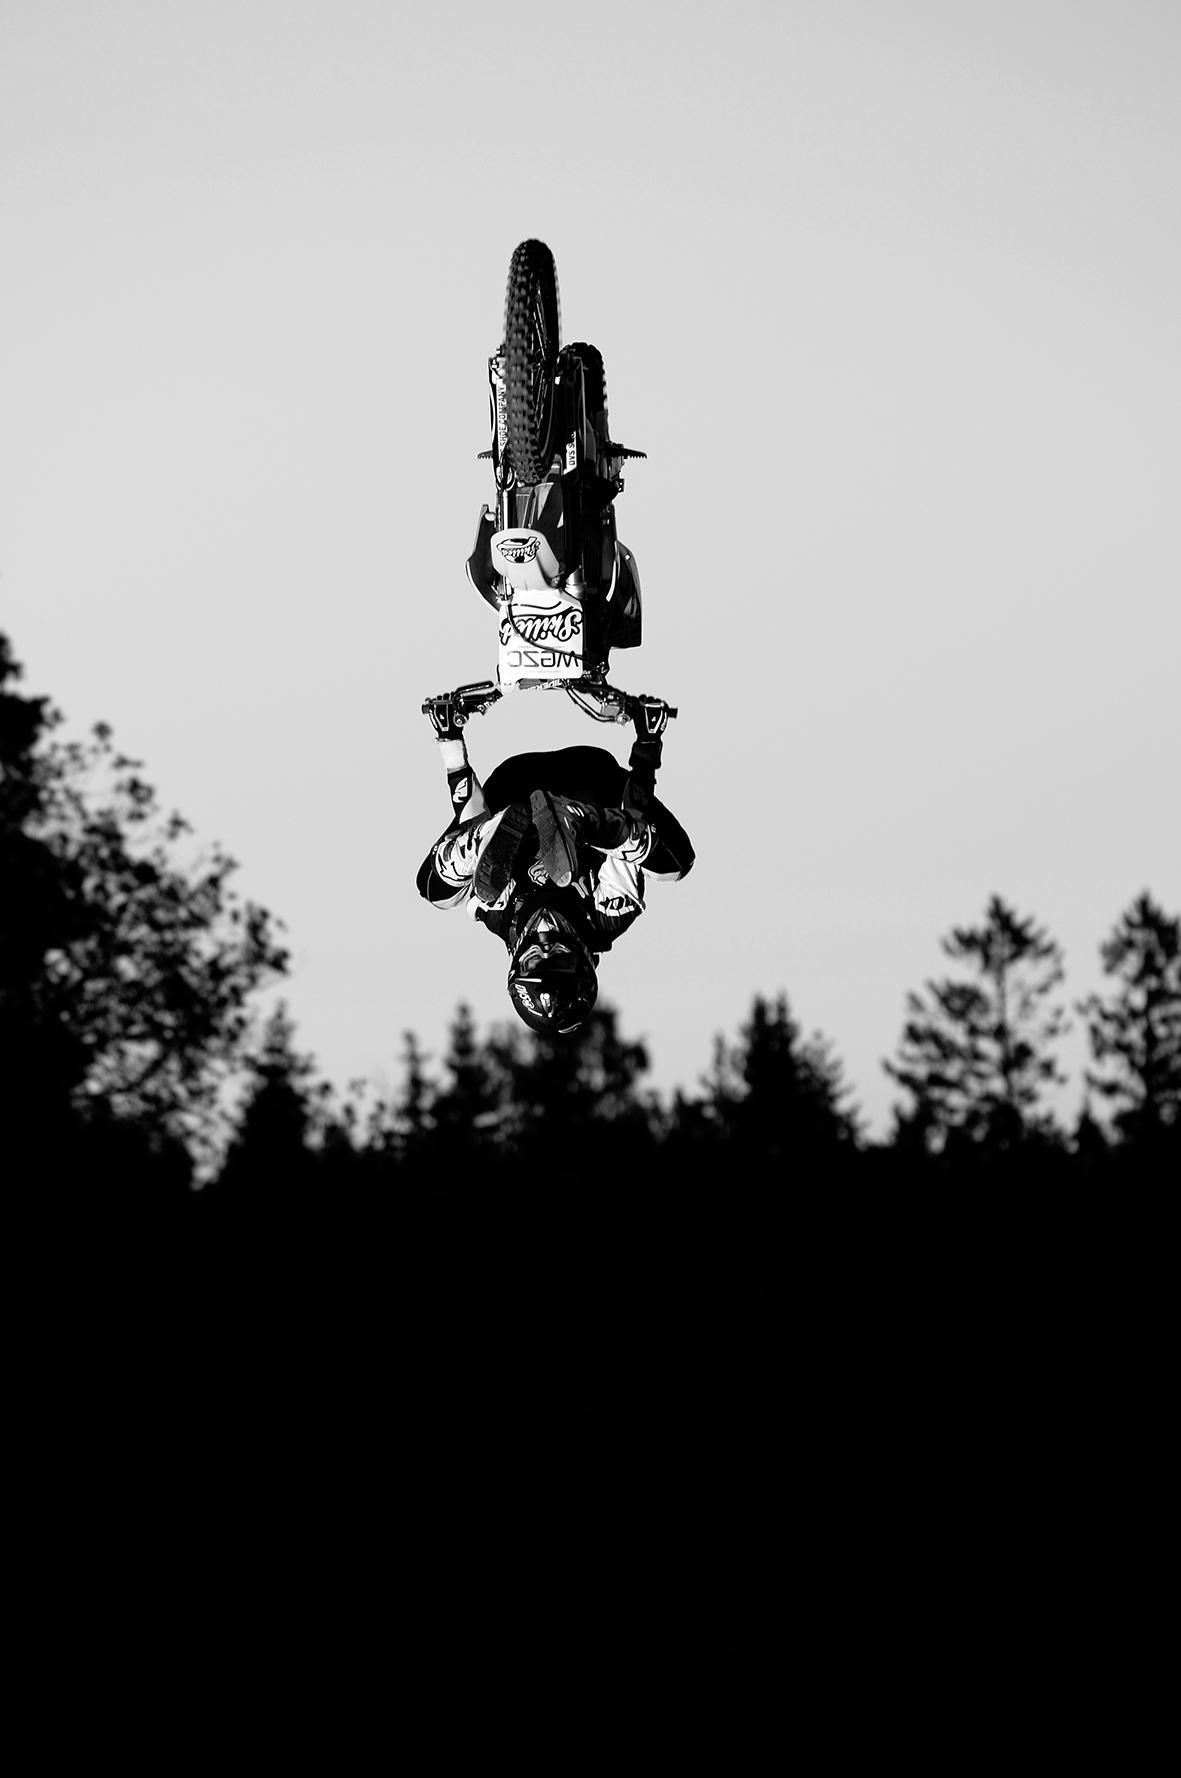 DSC_0082-Fredrik_Johansson.jpg